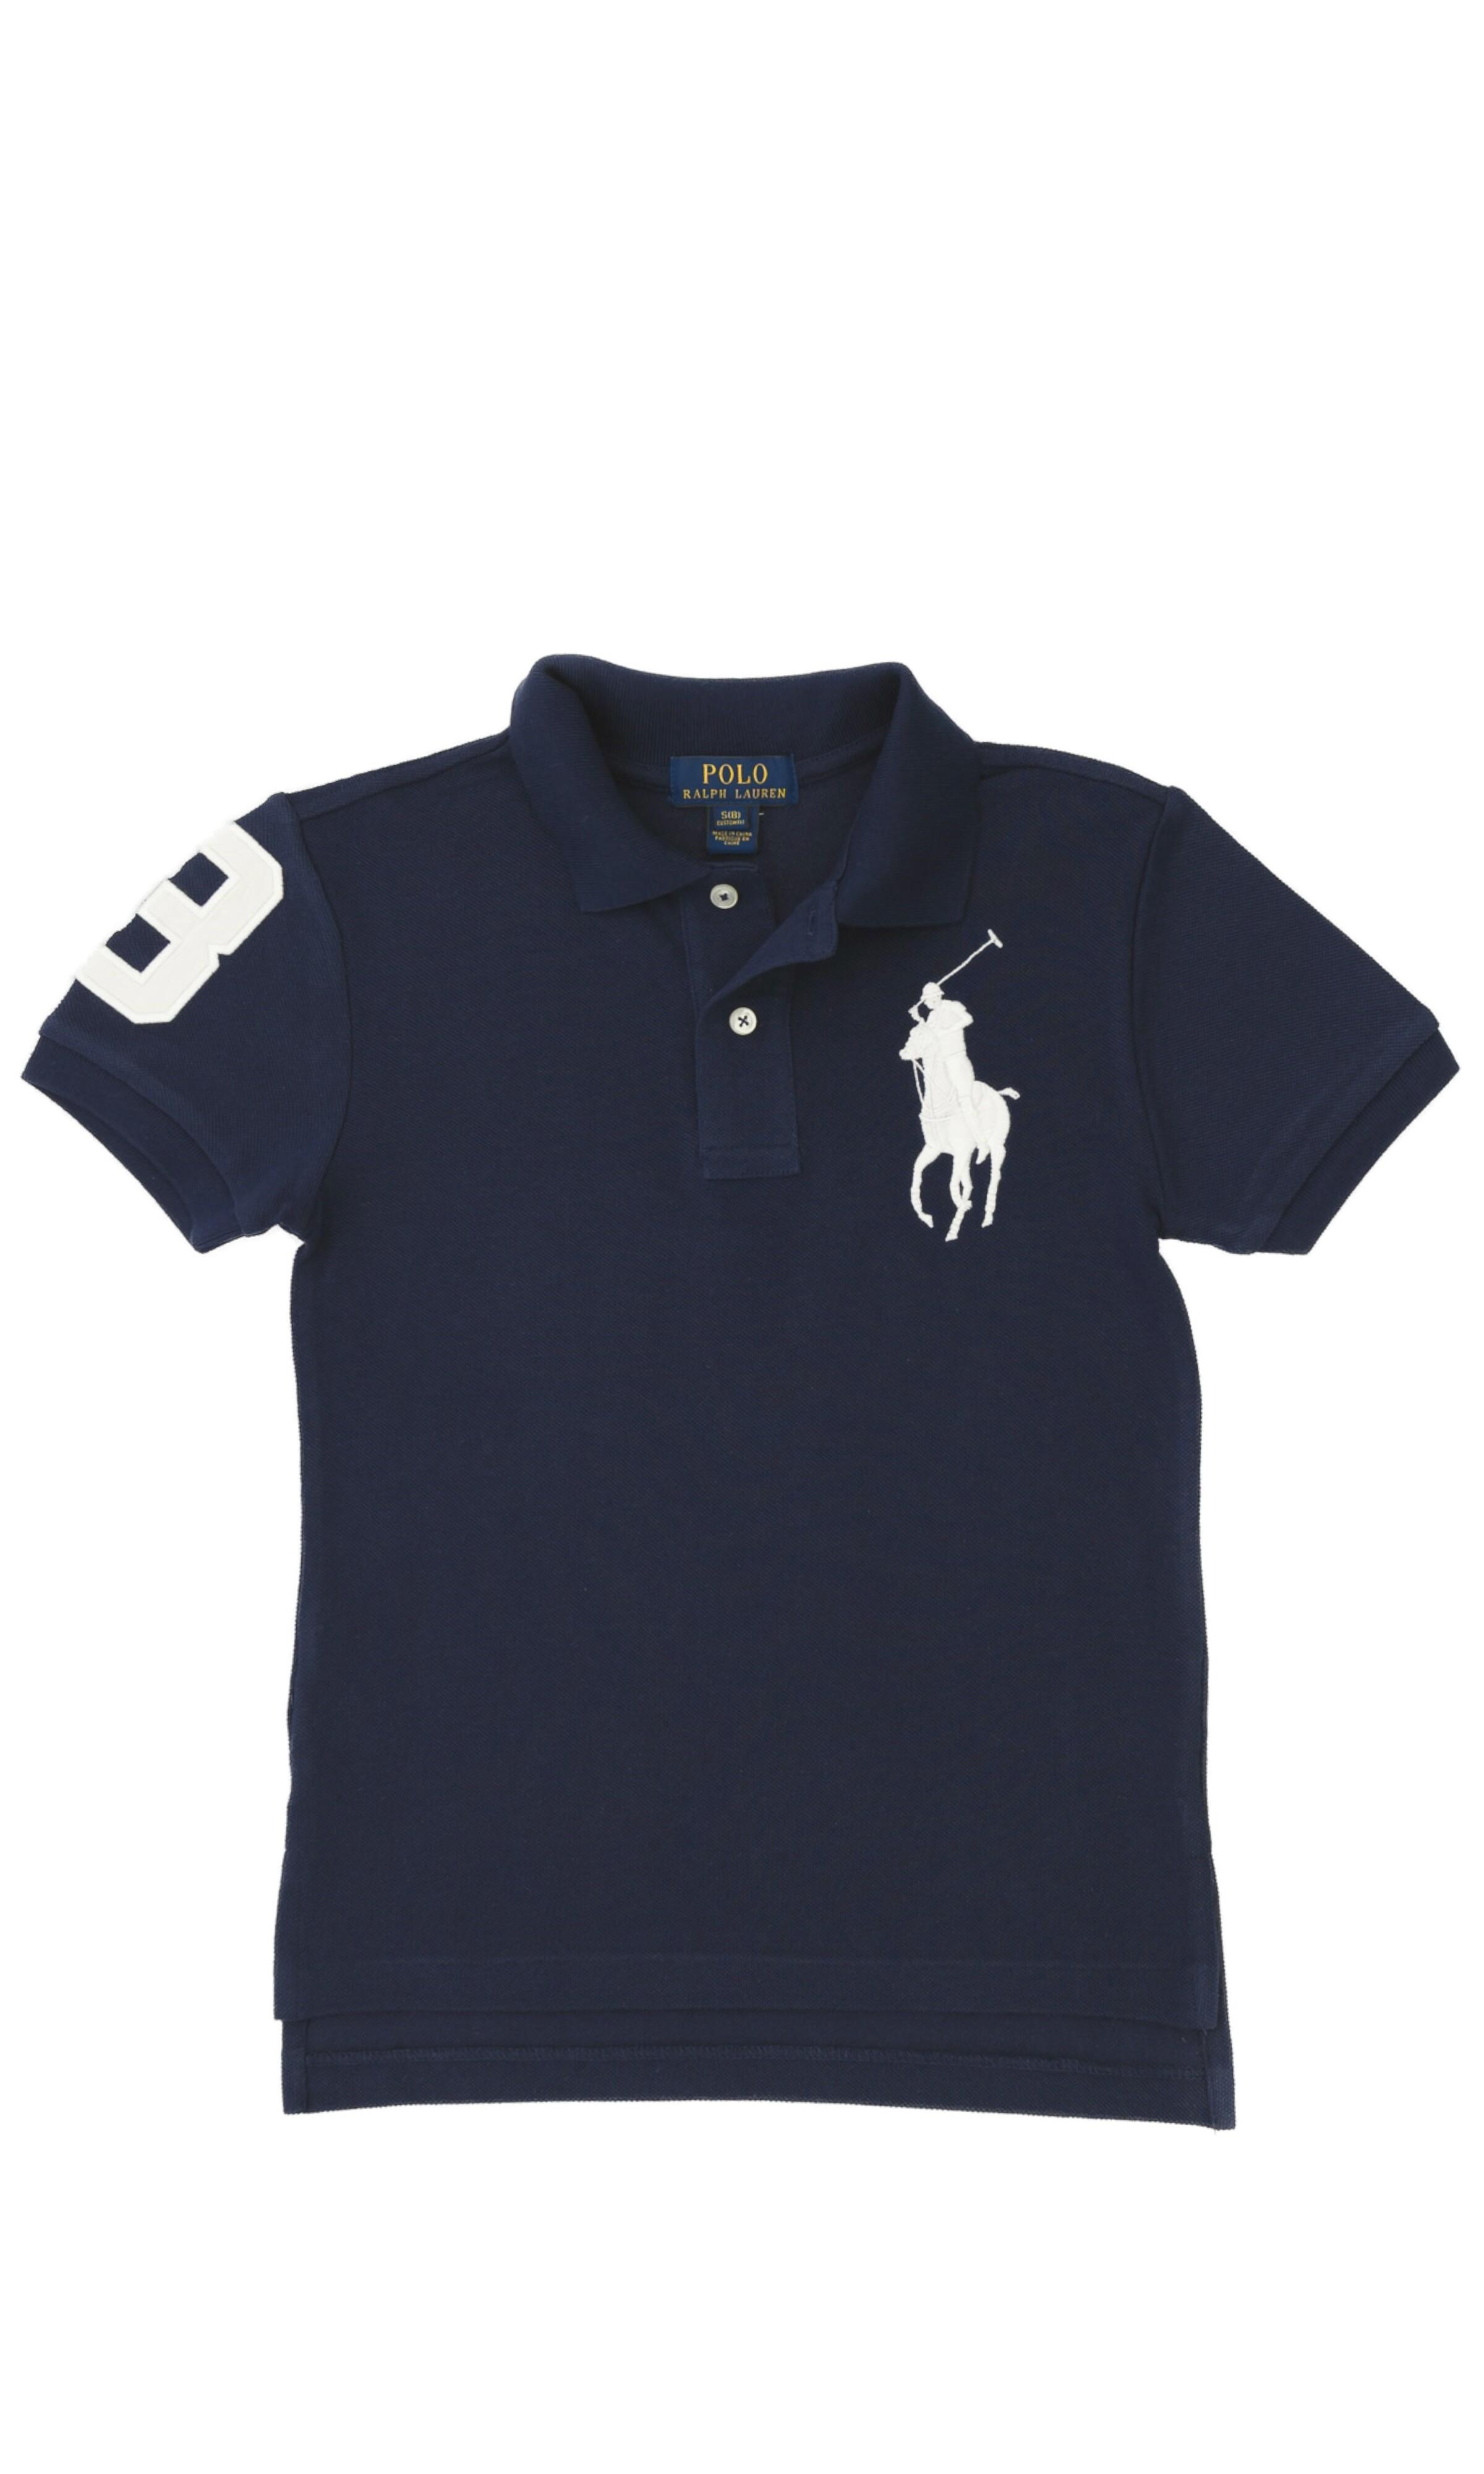 Boy's navy blue polo shirt, Polo Ralph Lauren - Celebrity-Club